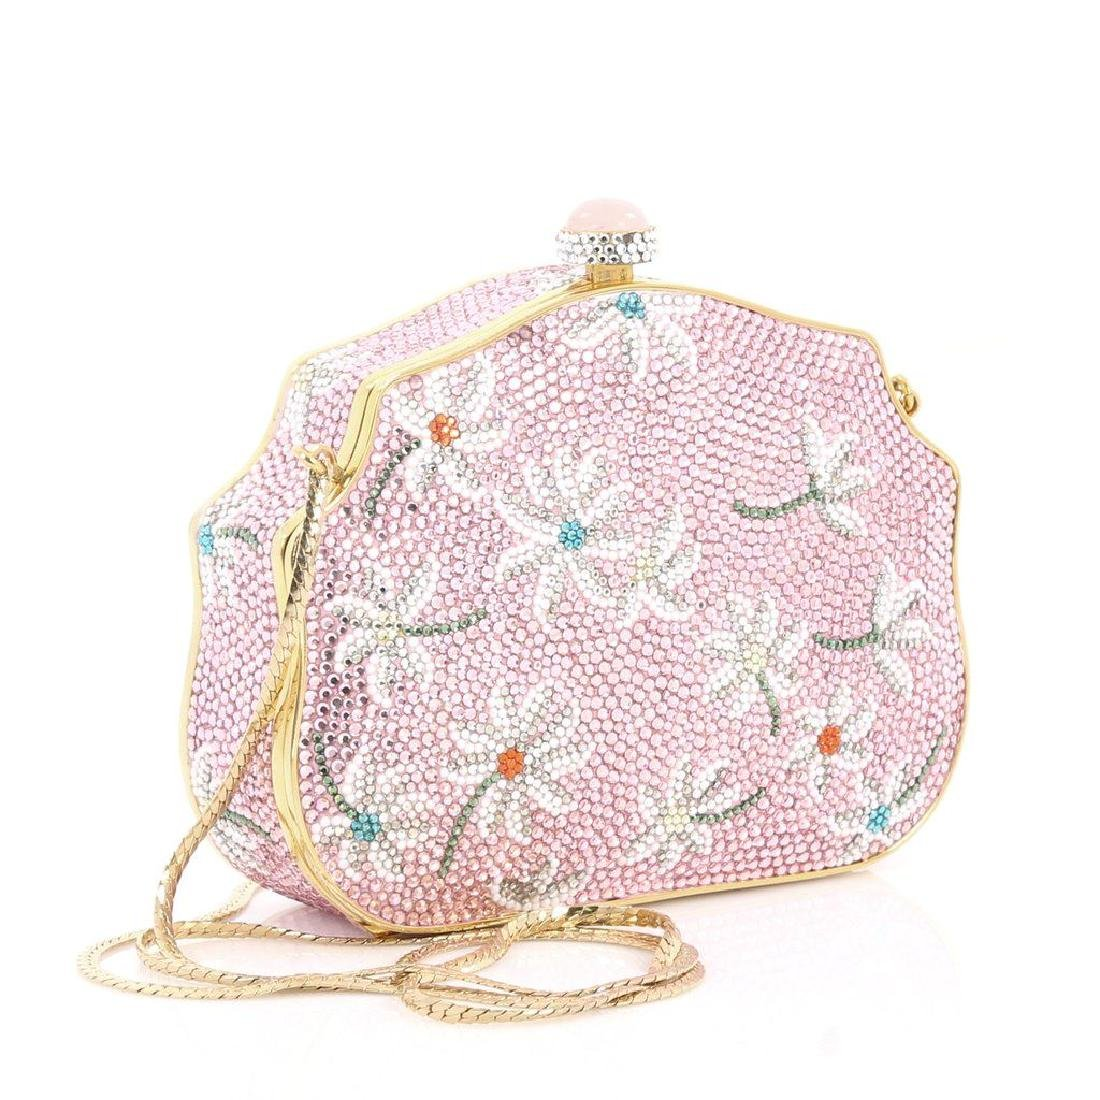 Judith Leiber Crystal Floral Minaudiere Chain Bag